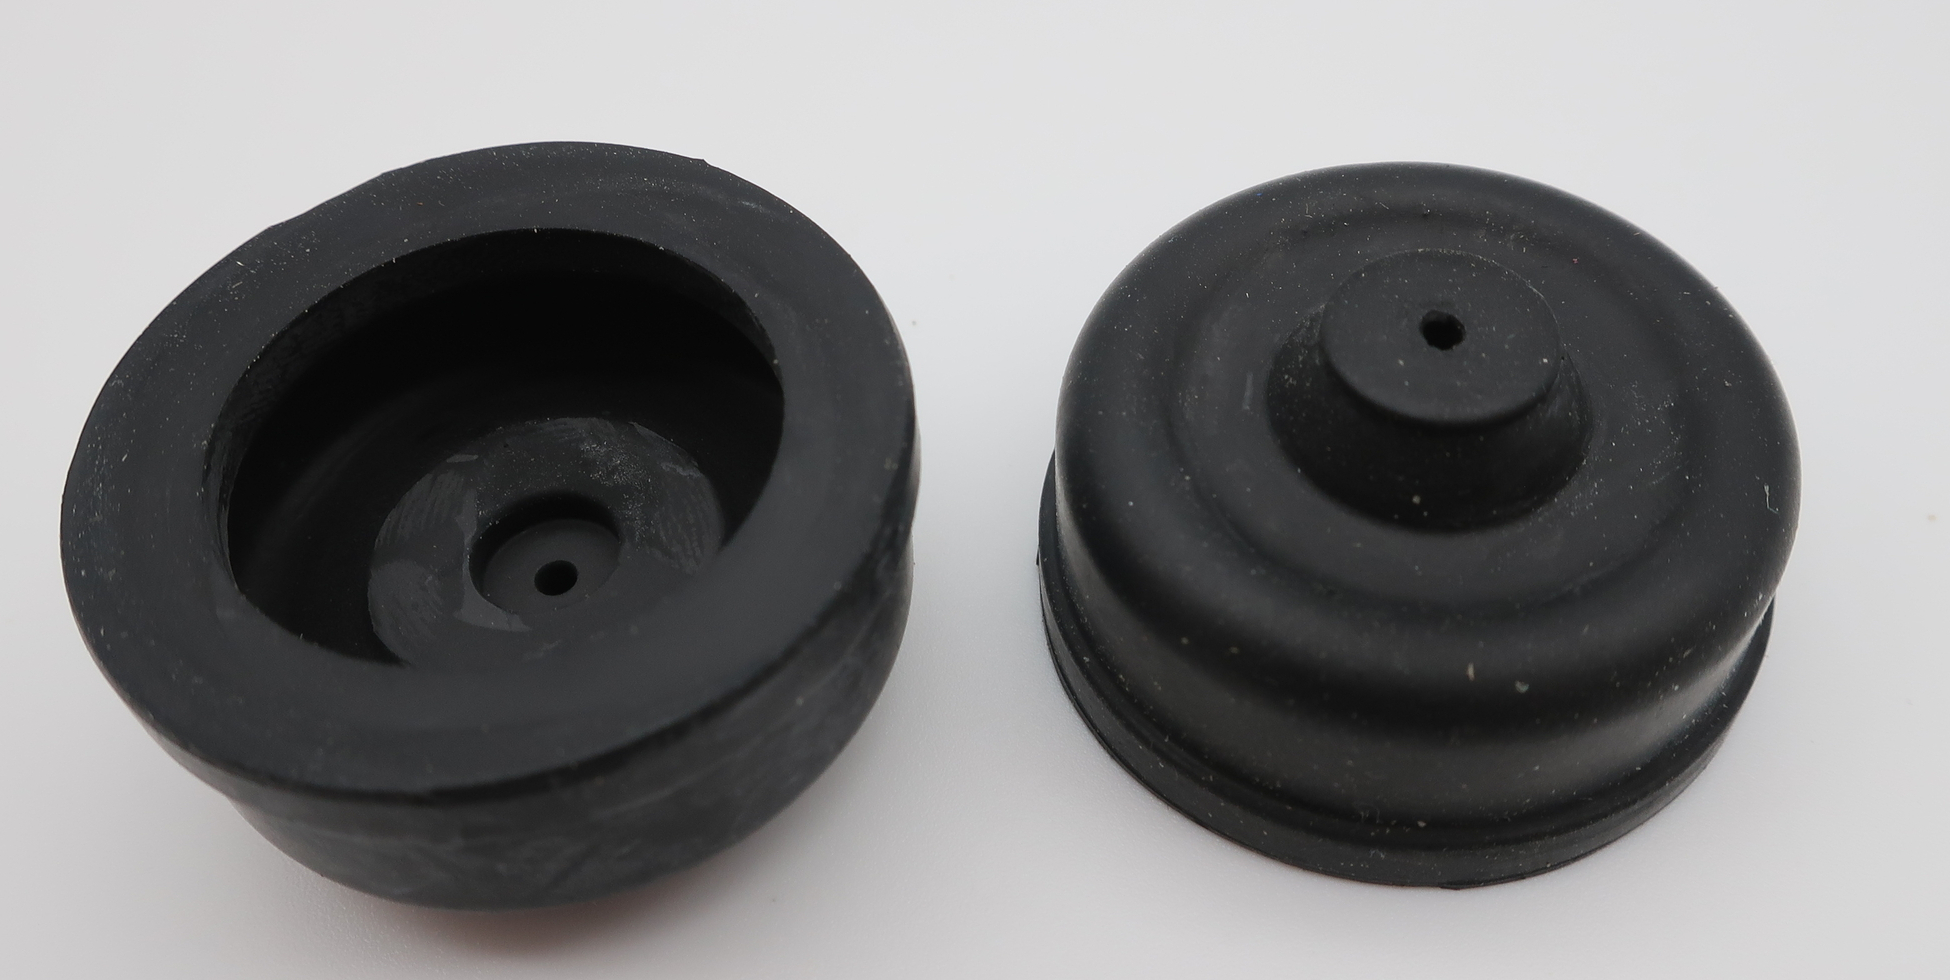 SuperFish Membrane SuperFish Air-Flow 2 / Pond Air-Kit 2 / Air-Box 2